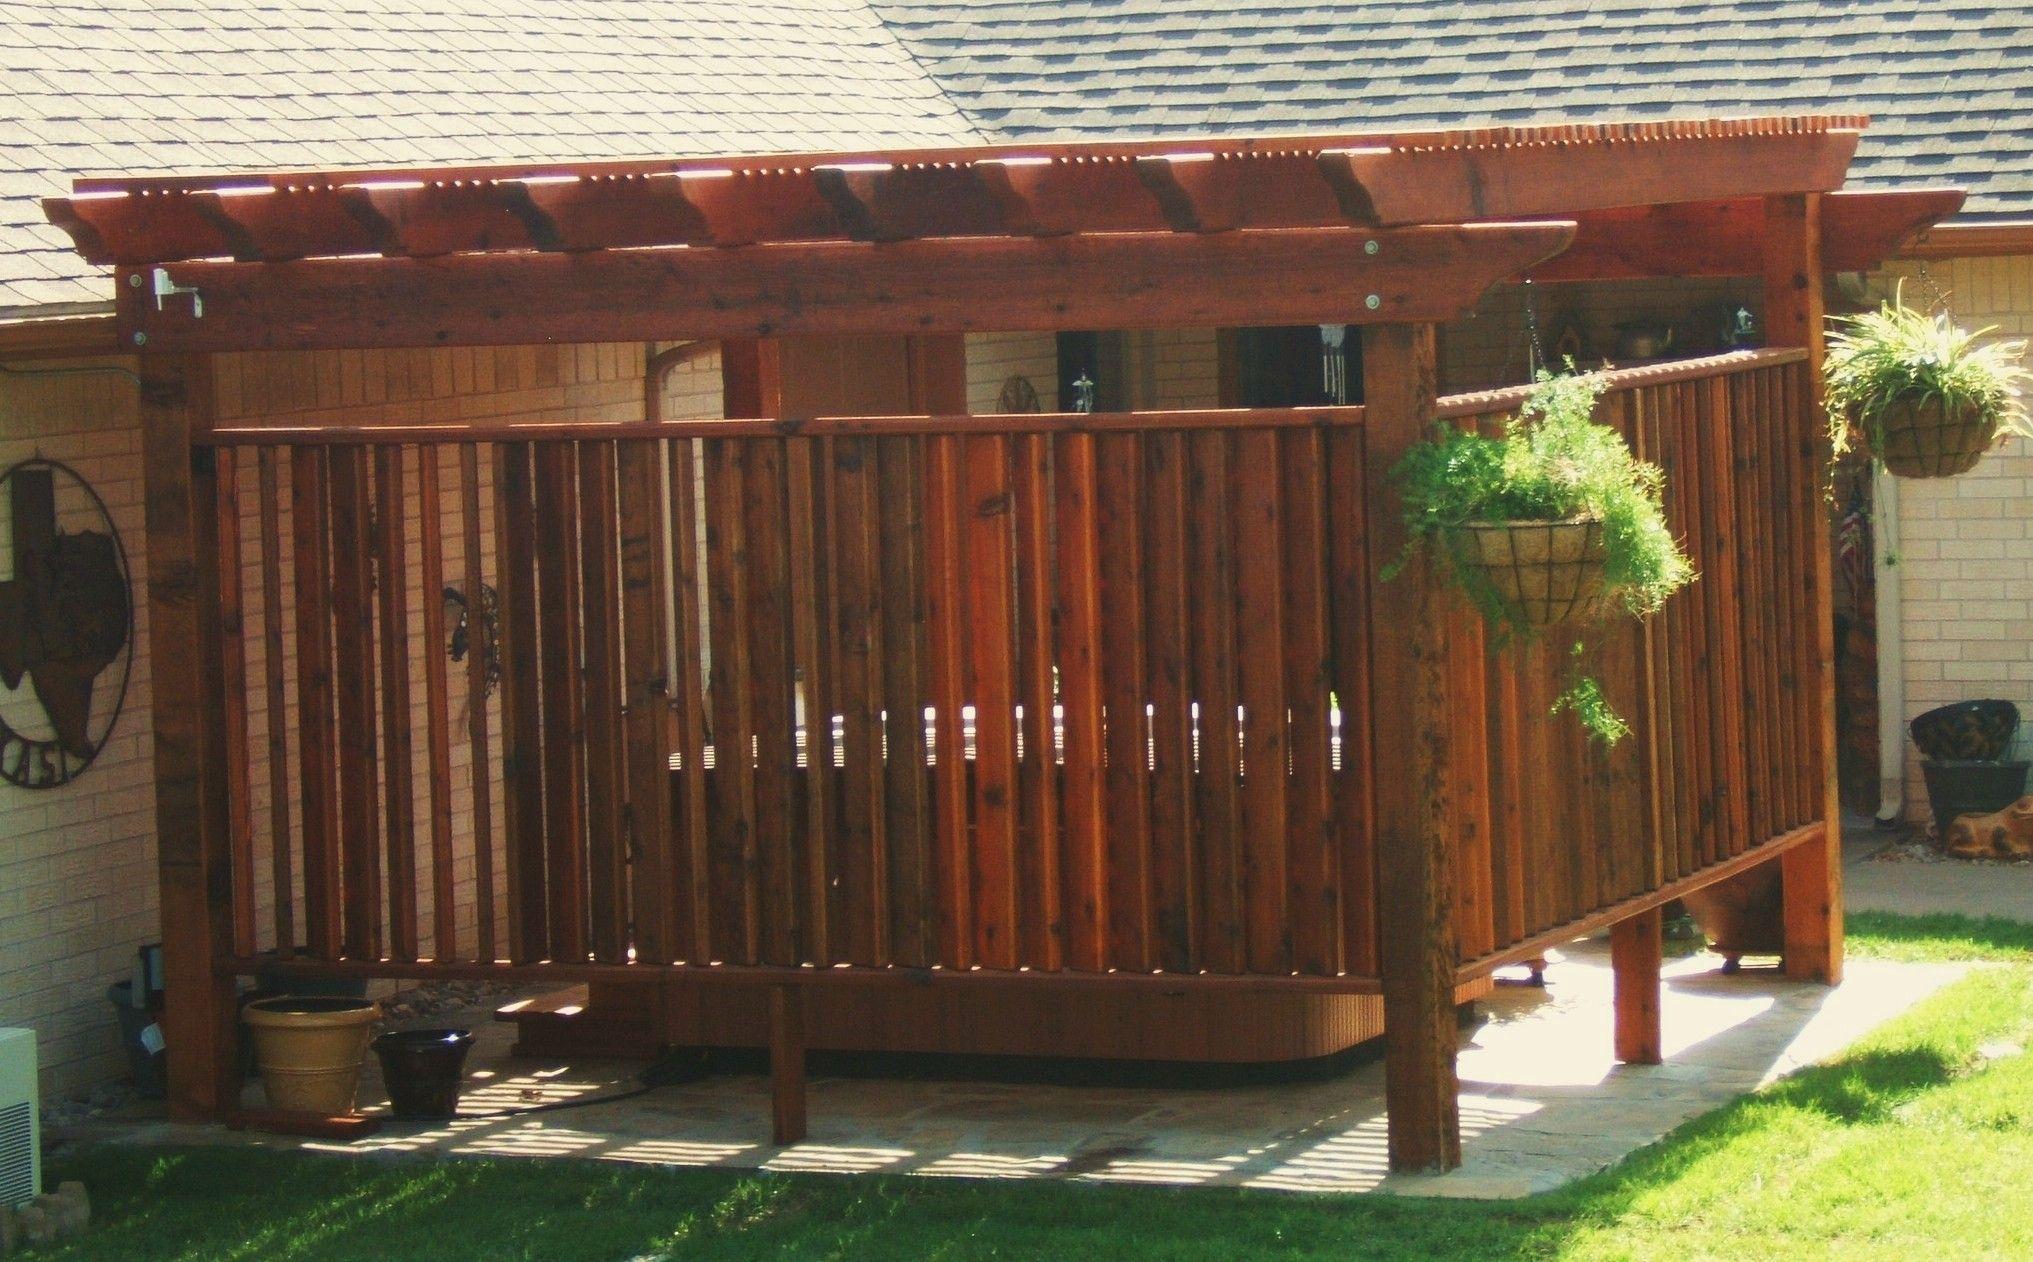 Enclosed Hot Tub Hot Tub Outdoor Hot Tub Privacy Hot Tub Backyard